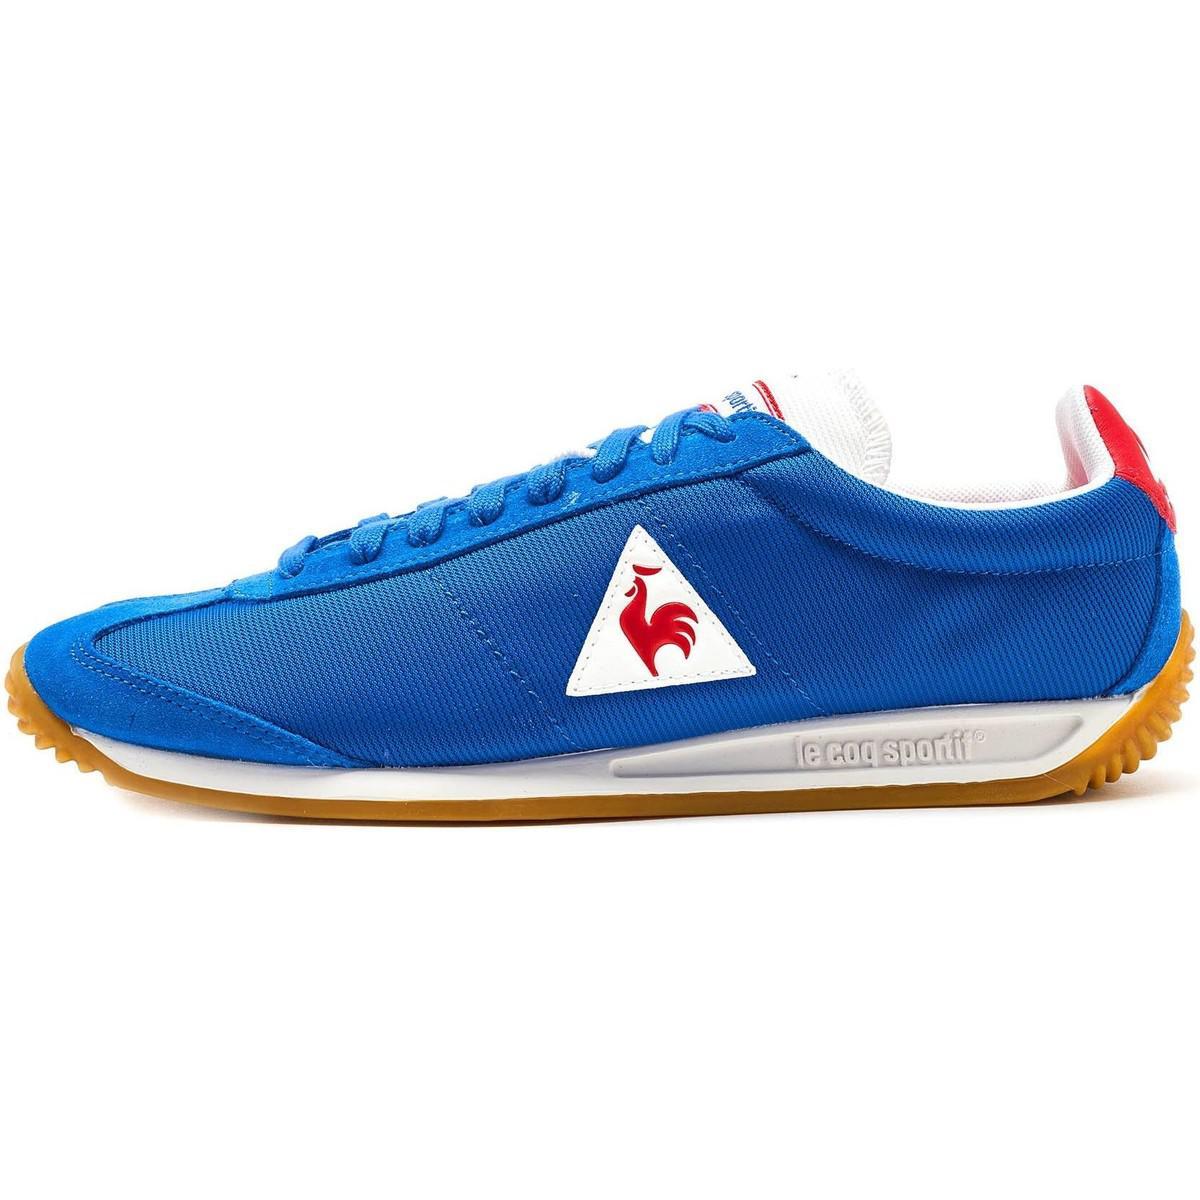 outlet store 634fd 11a2f Le Coq Sportif Quartz Nylon Gum Trainers In Classic Blue Vintage Red ...